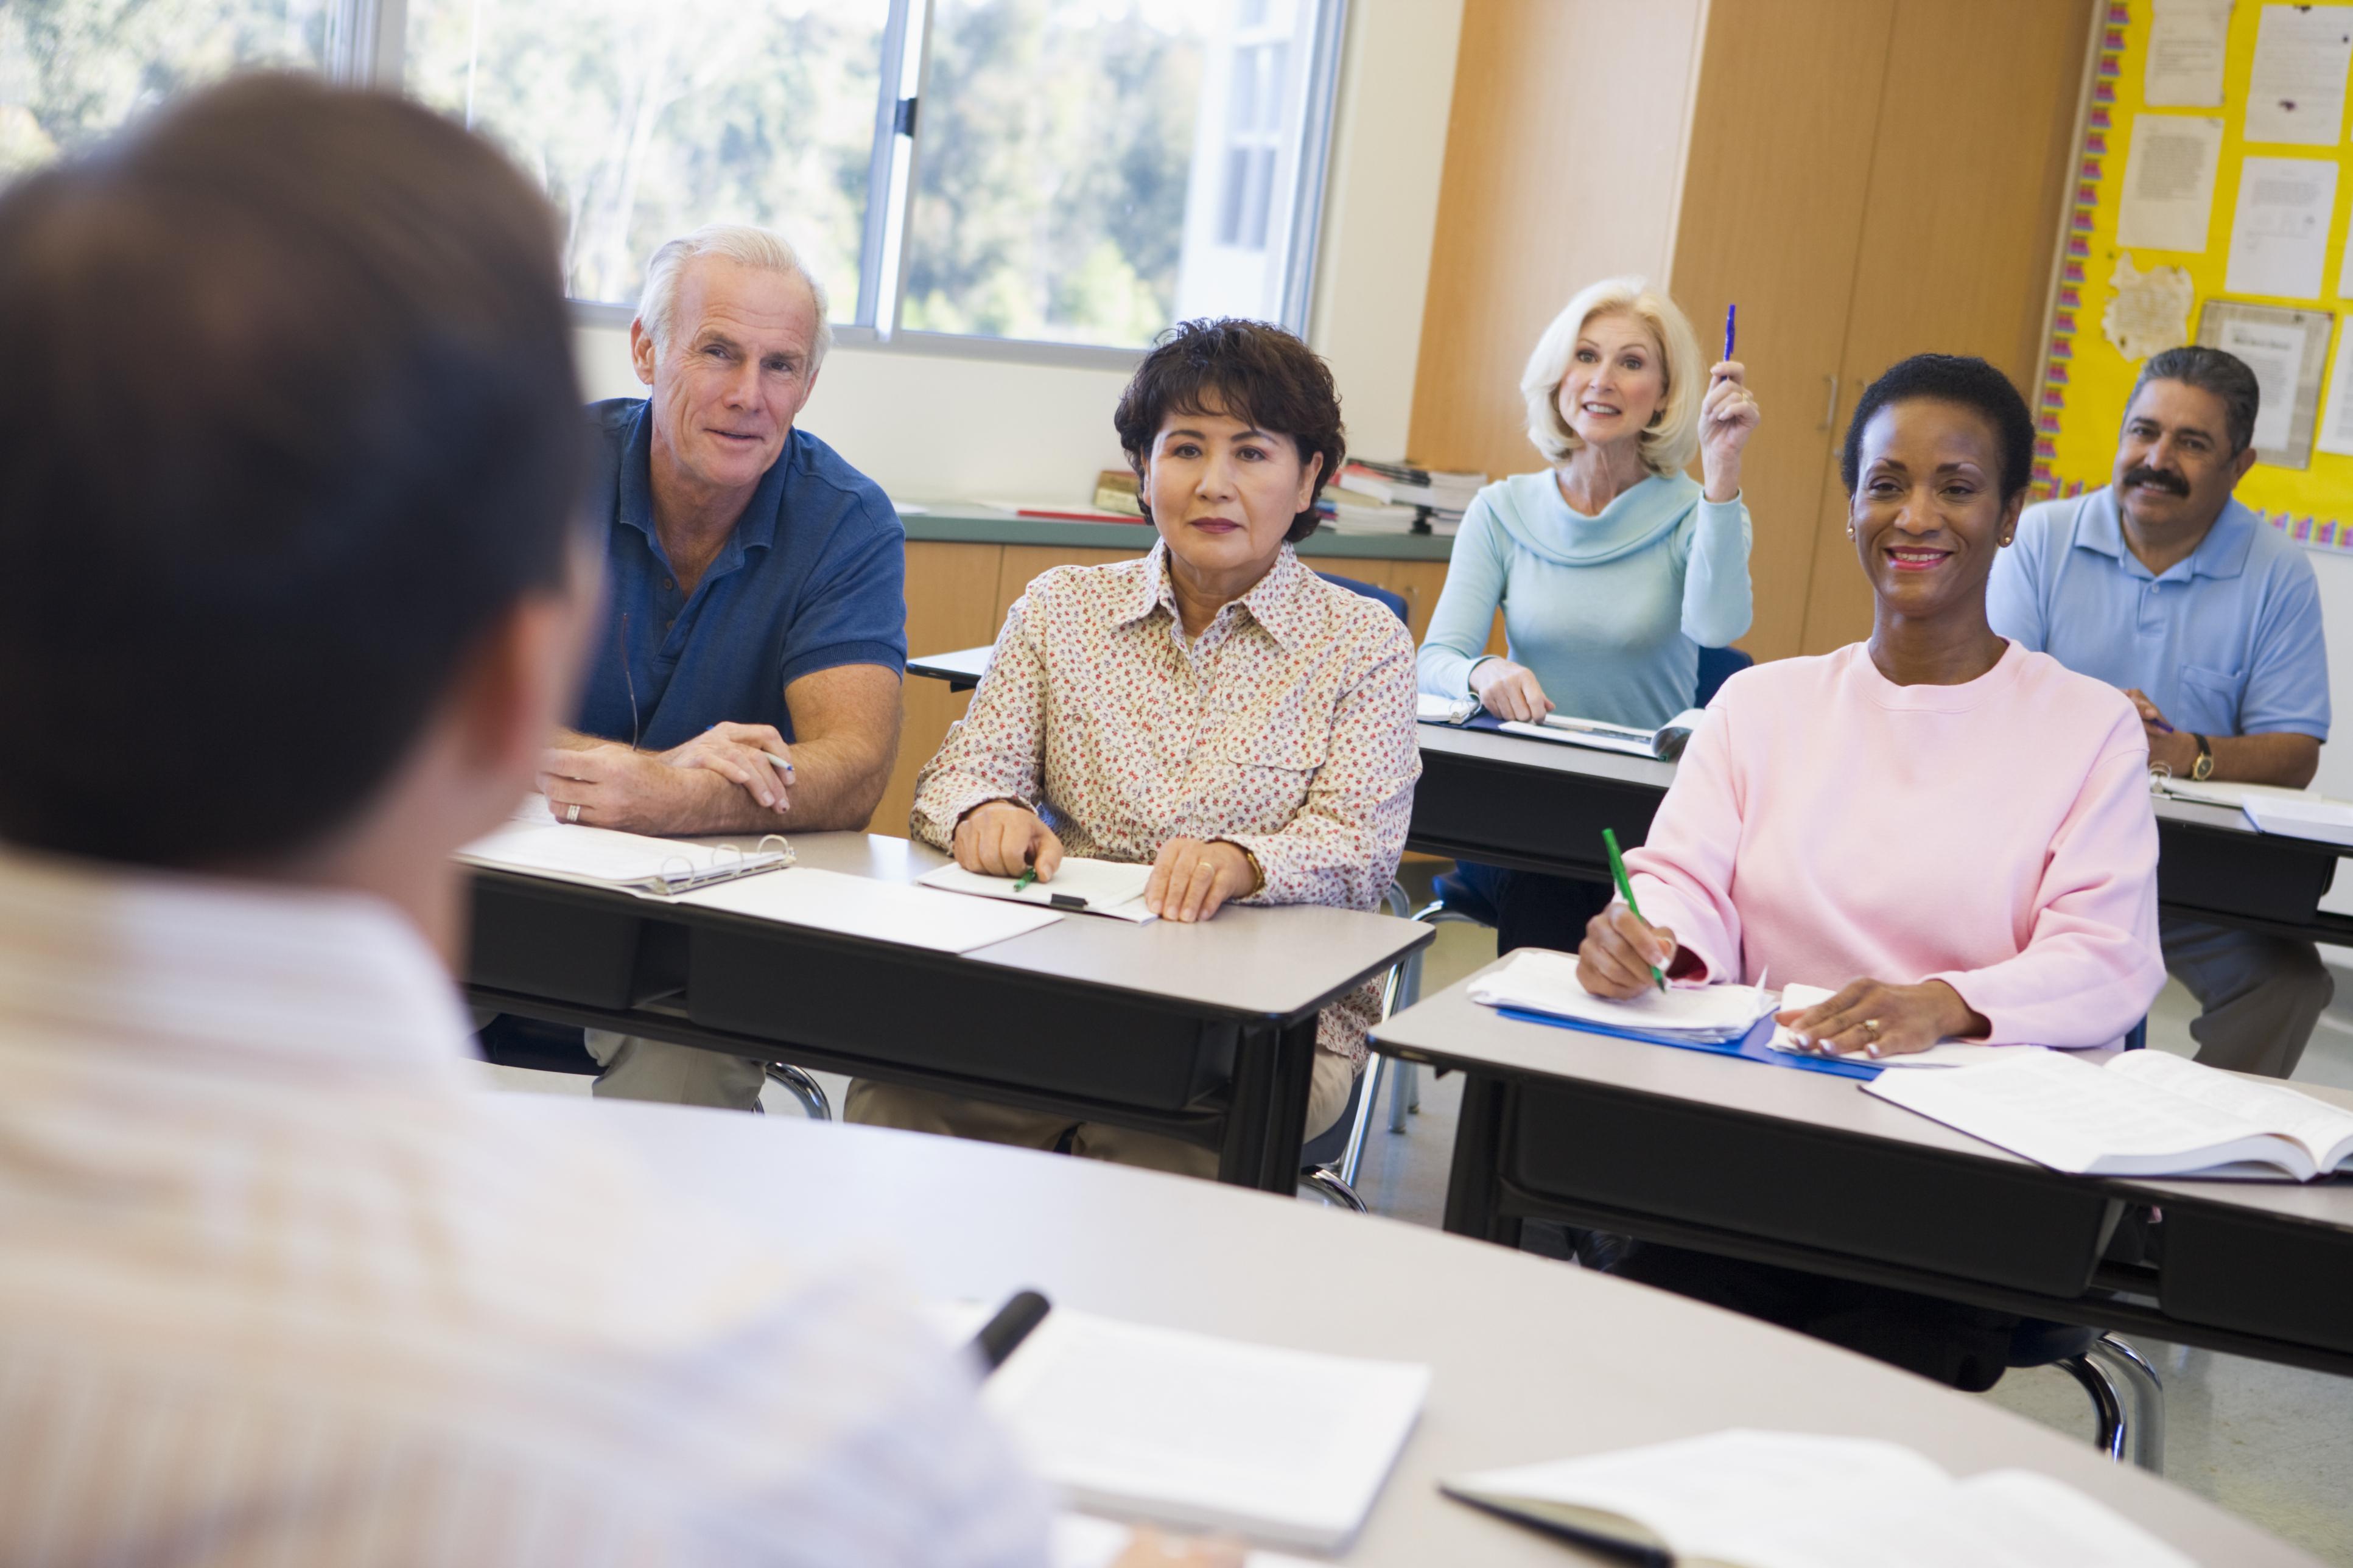 Mature female student raising hand in class